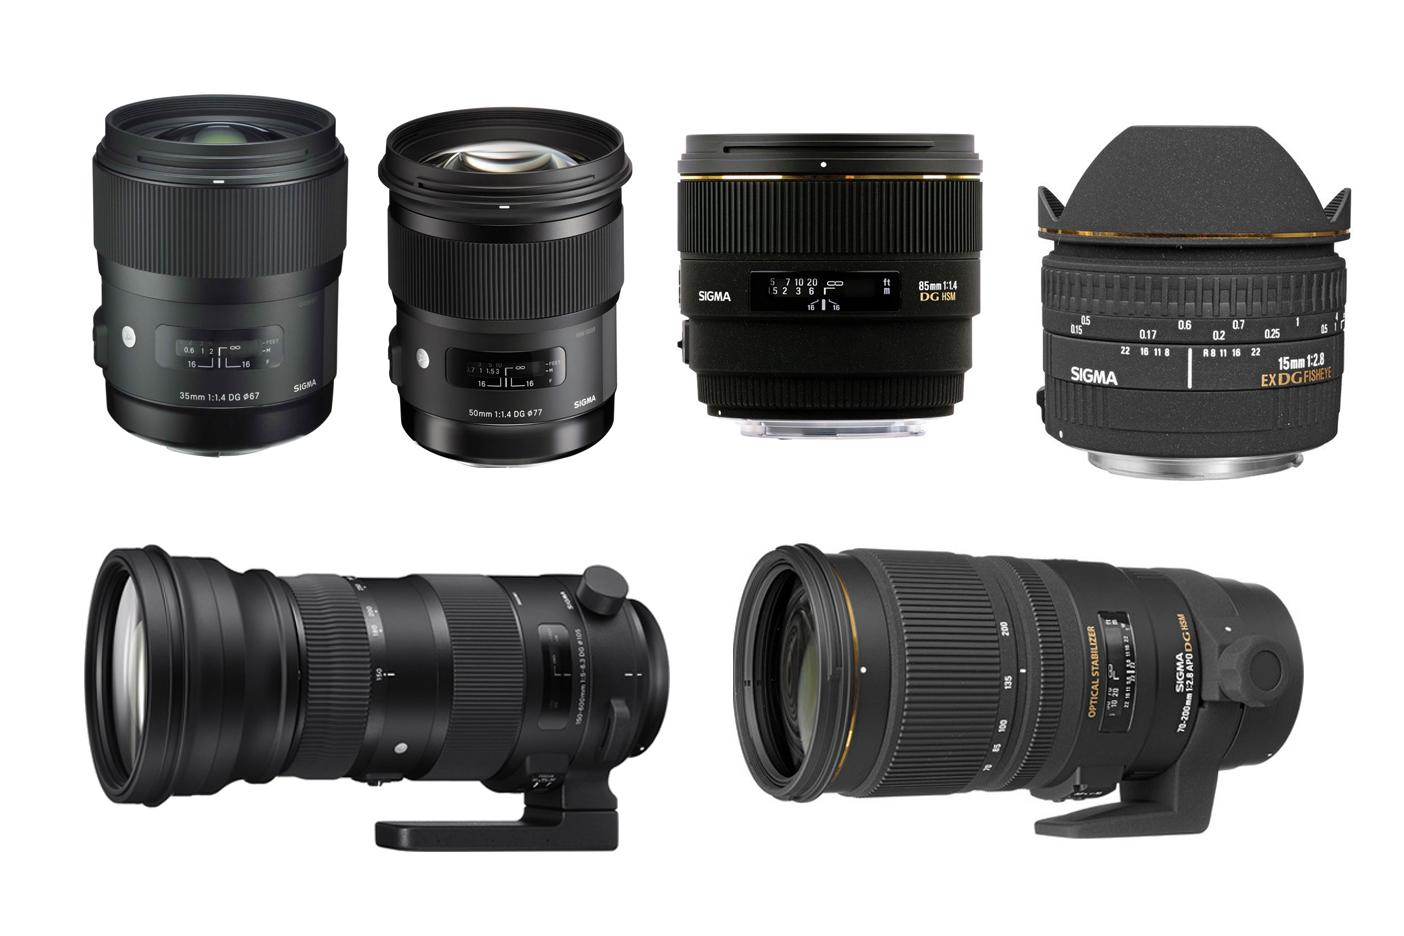 2018 Sigma Lenses Cyber Monday Deals Sales Lens Rumors 50mm F 28 Ex Dg Macro Canon Black Friday